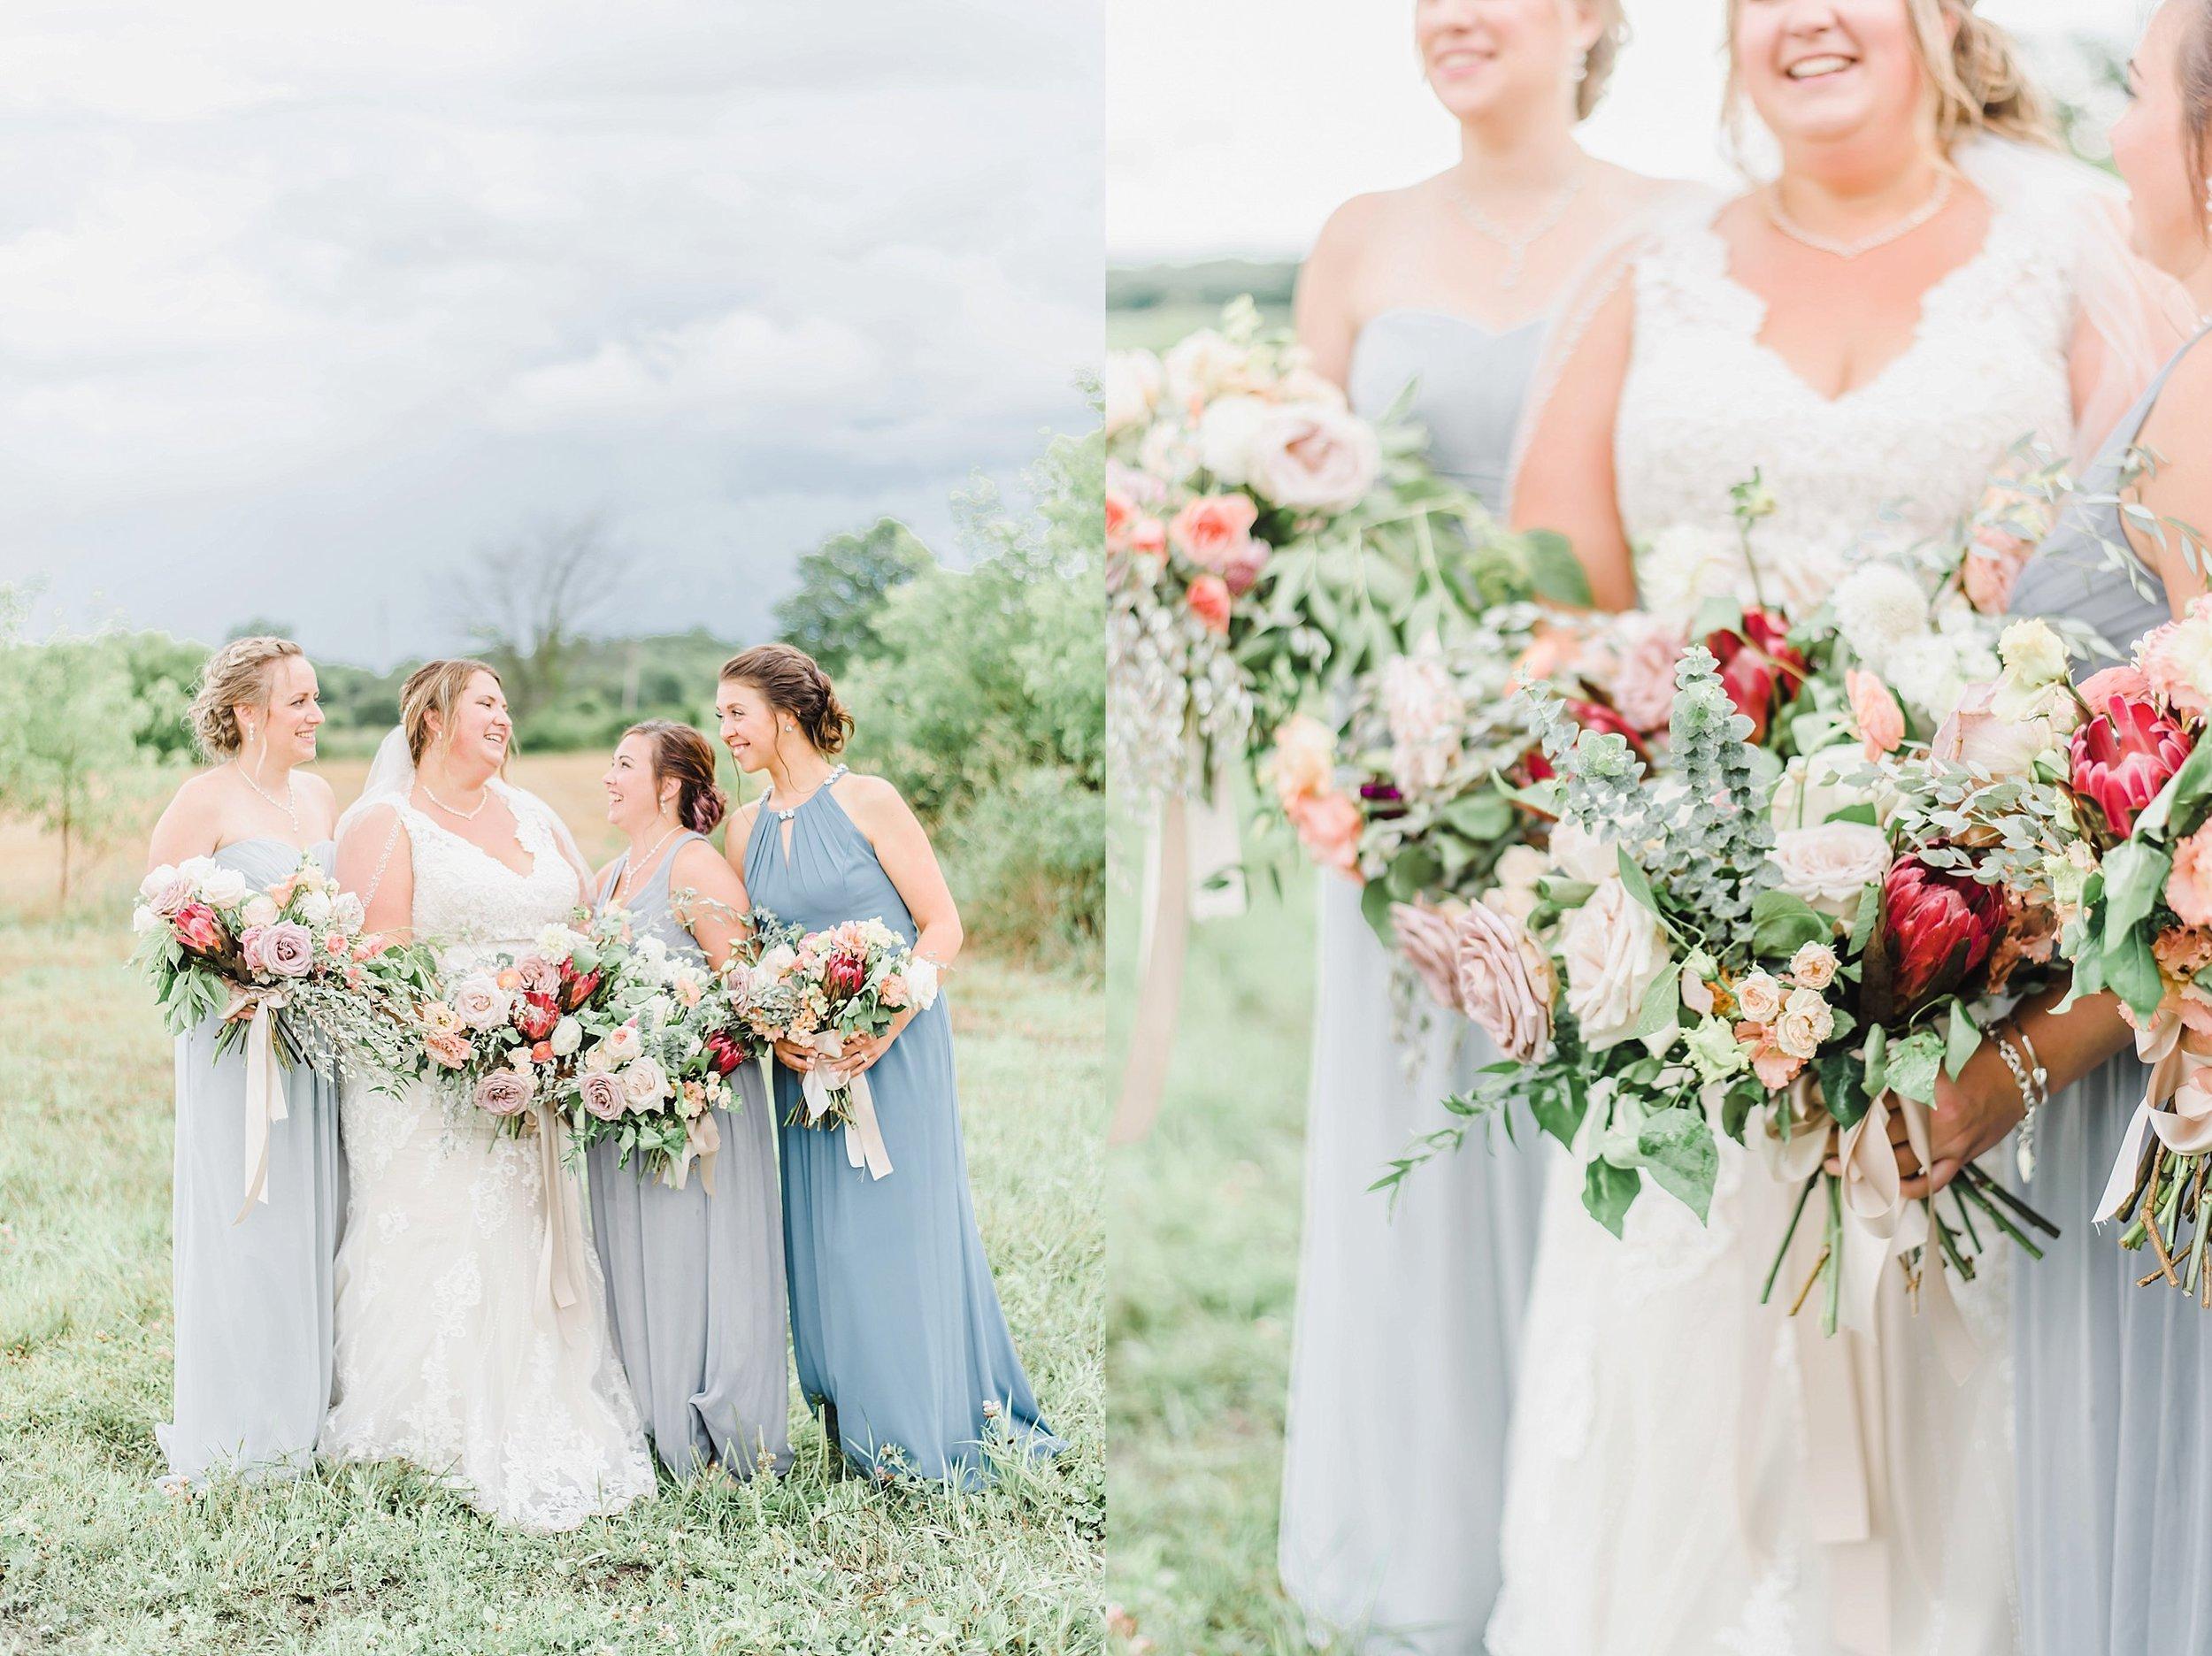 light airy indie fine art ottawa wedding photographer | Ali and Batoul Photography_0421.jpg